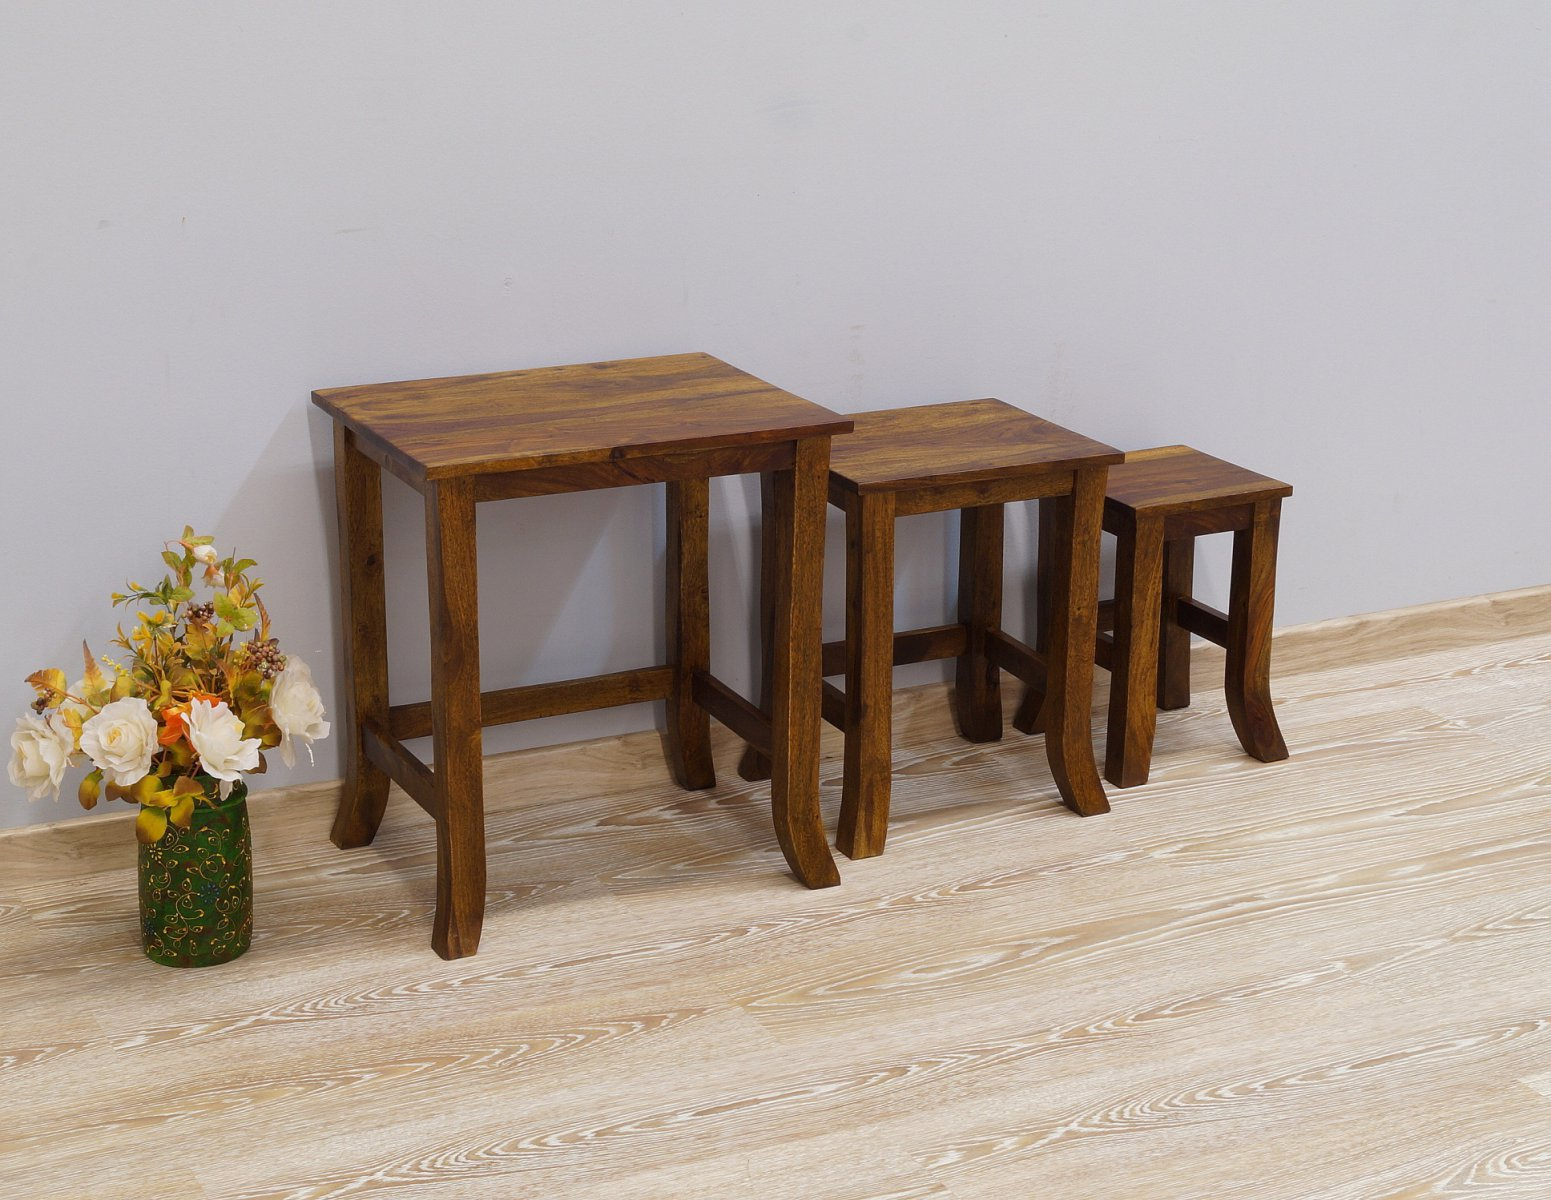 Taboret kolonialny stolik stołek lite drewno palisander indyjski 3 sztuki gięte nogi